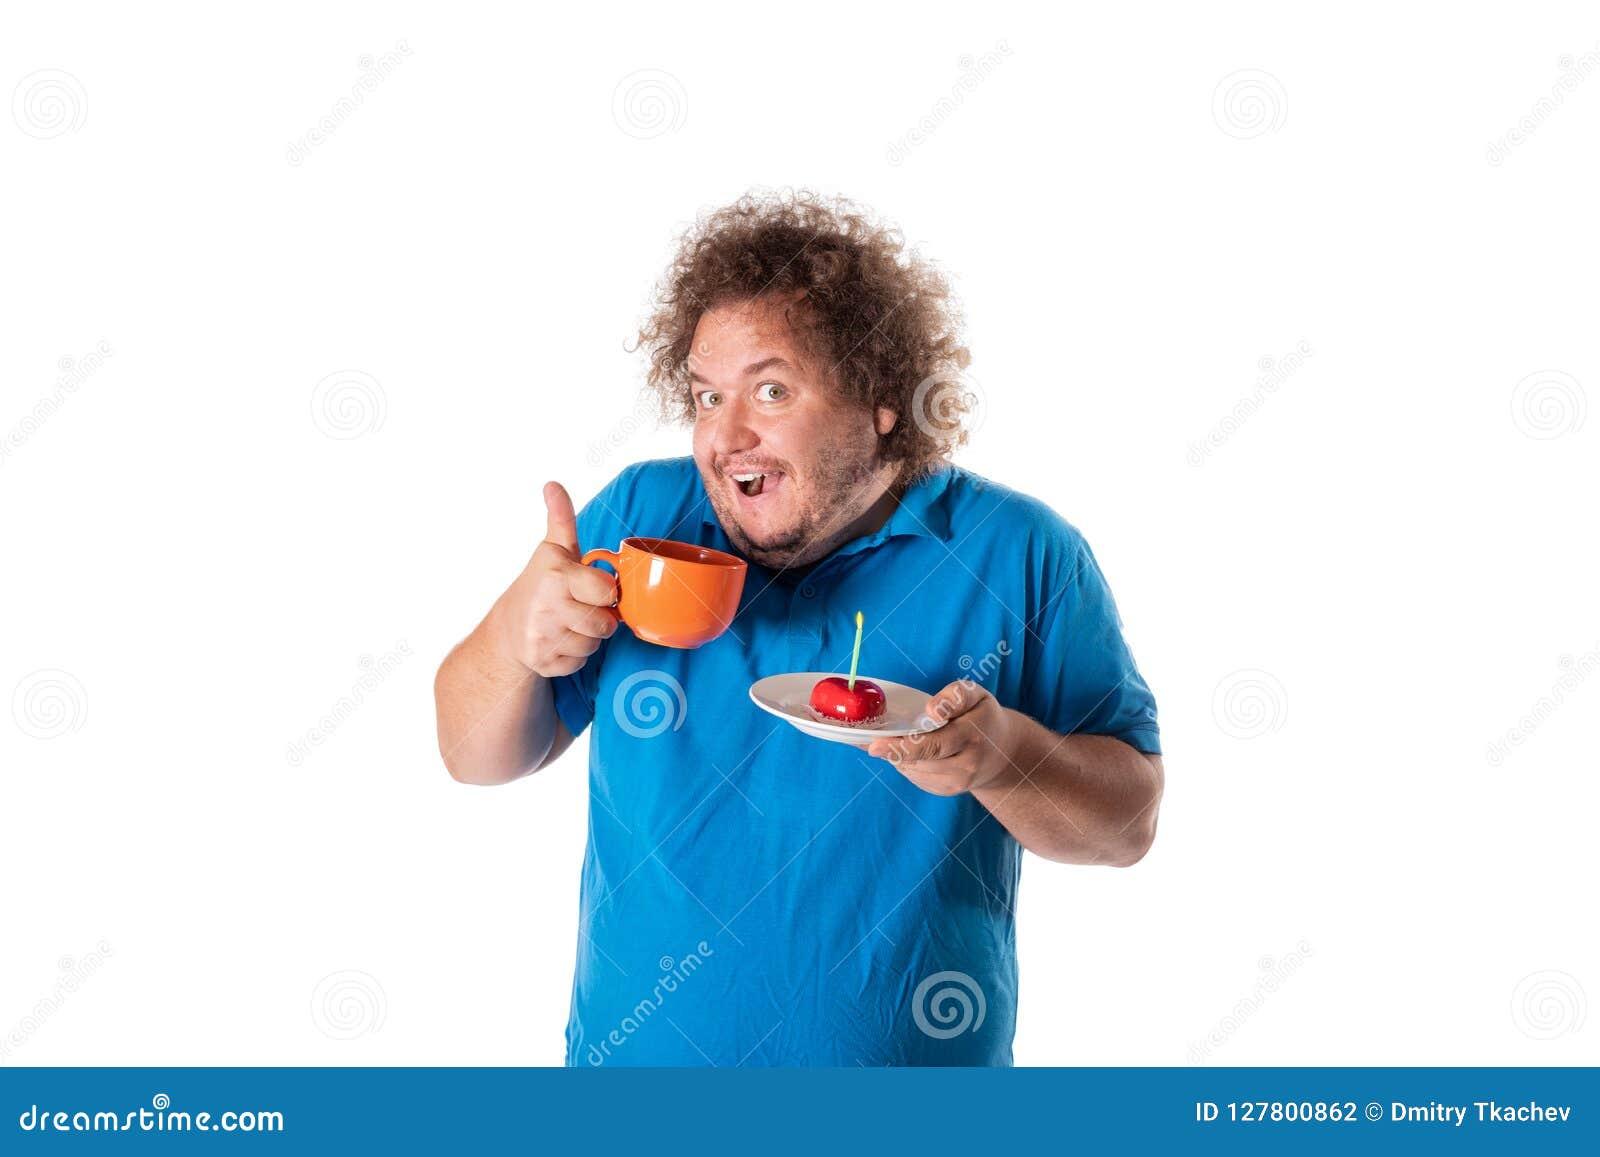 Funny fat man with mug and cake. Happy birthday